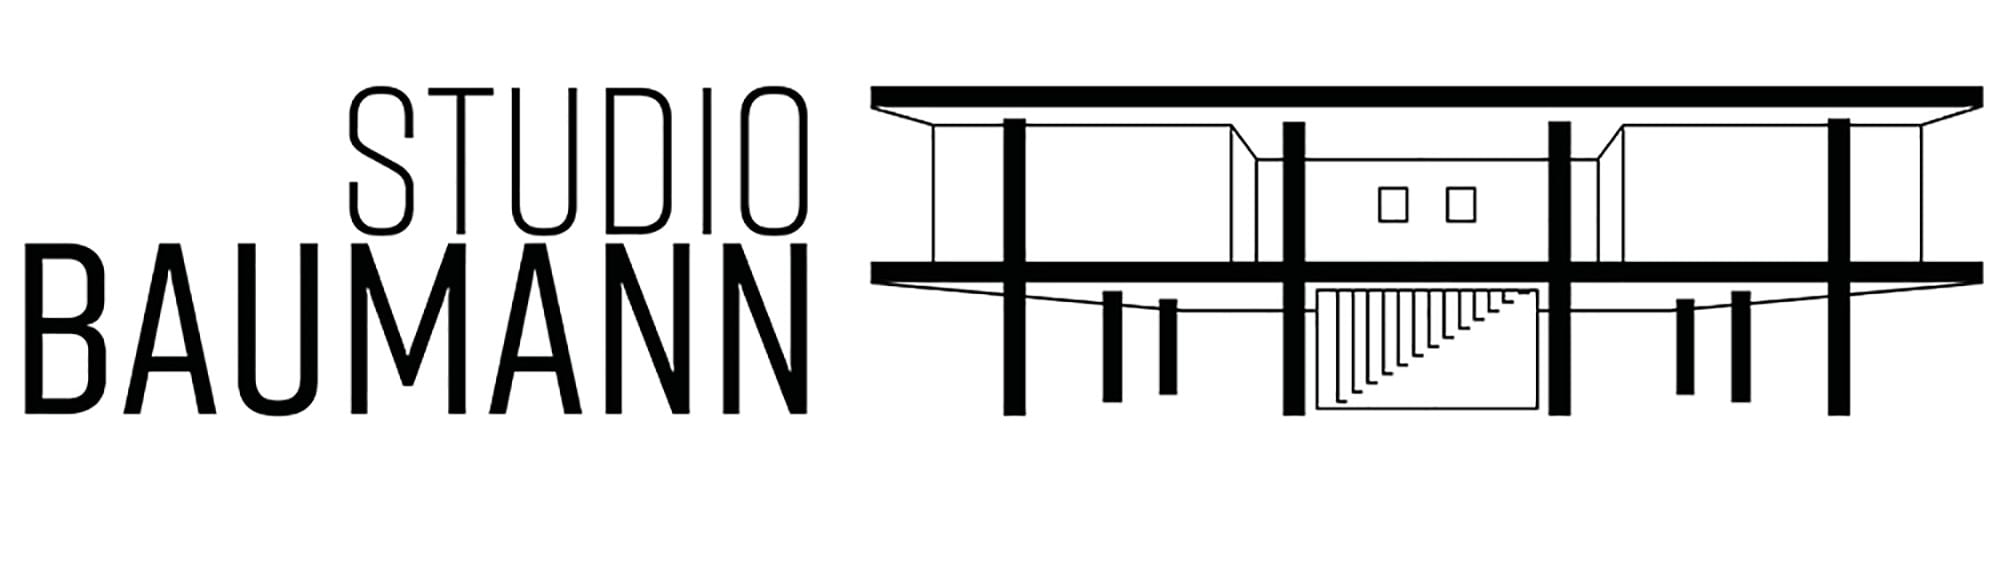 Studio Baumann